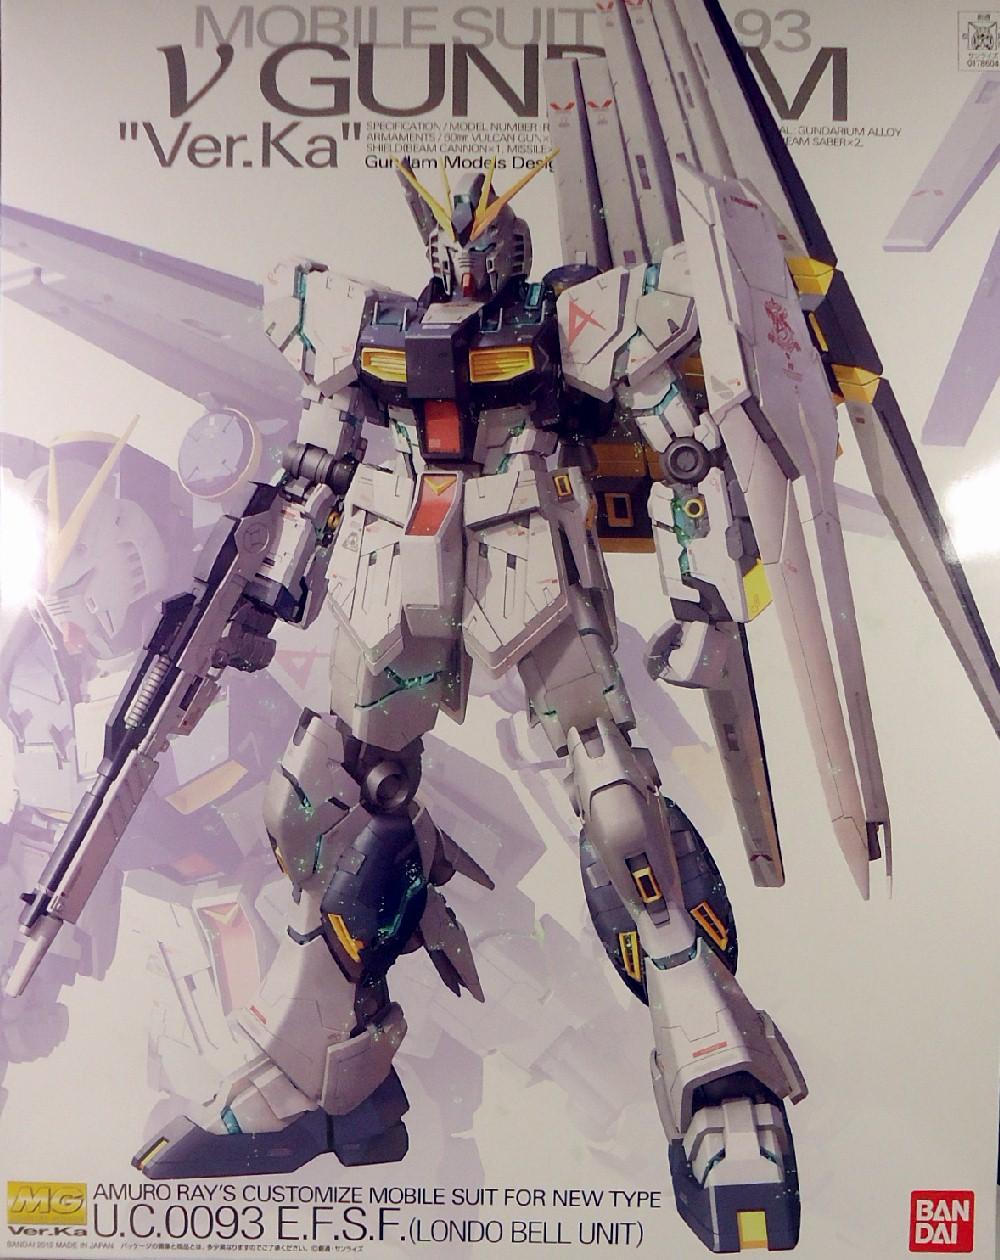 MG-NEW_GUNDAM-Ver_Ka-1.jpg